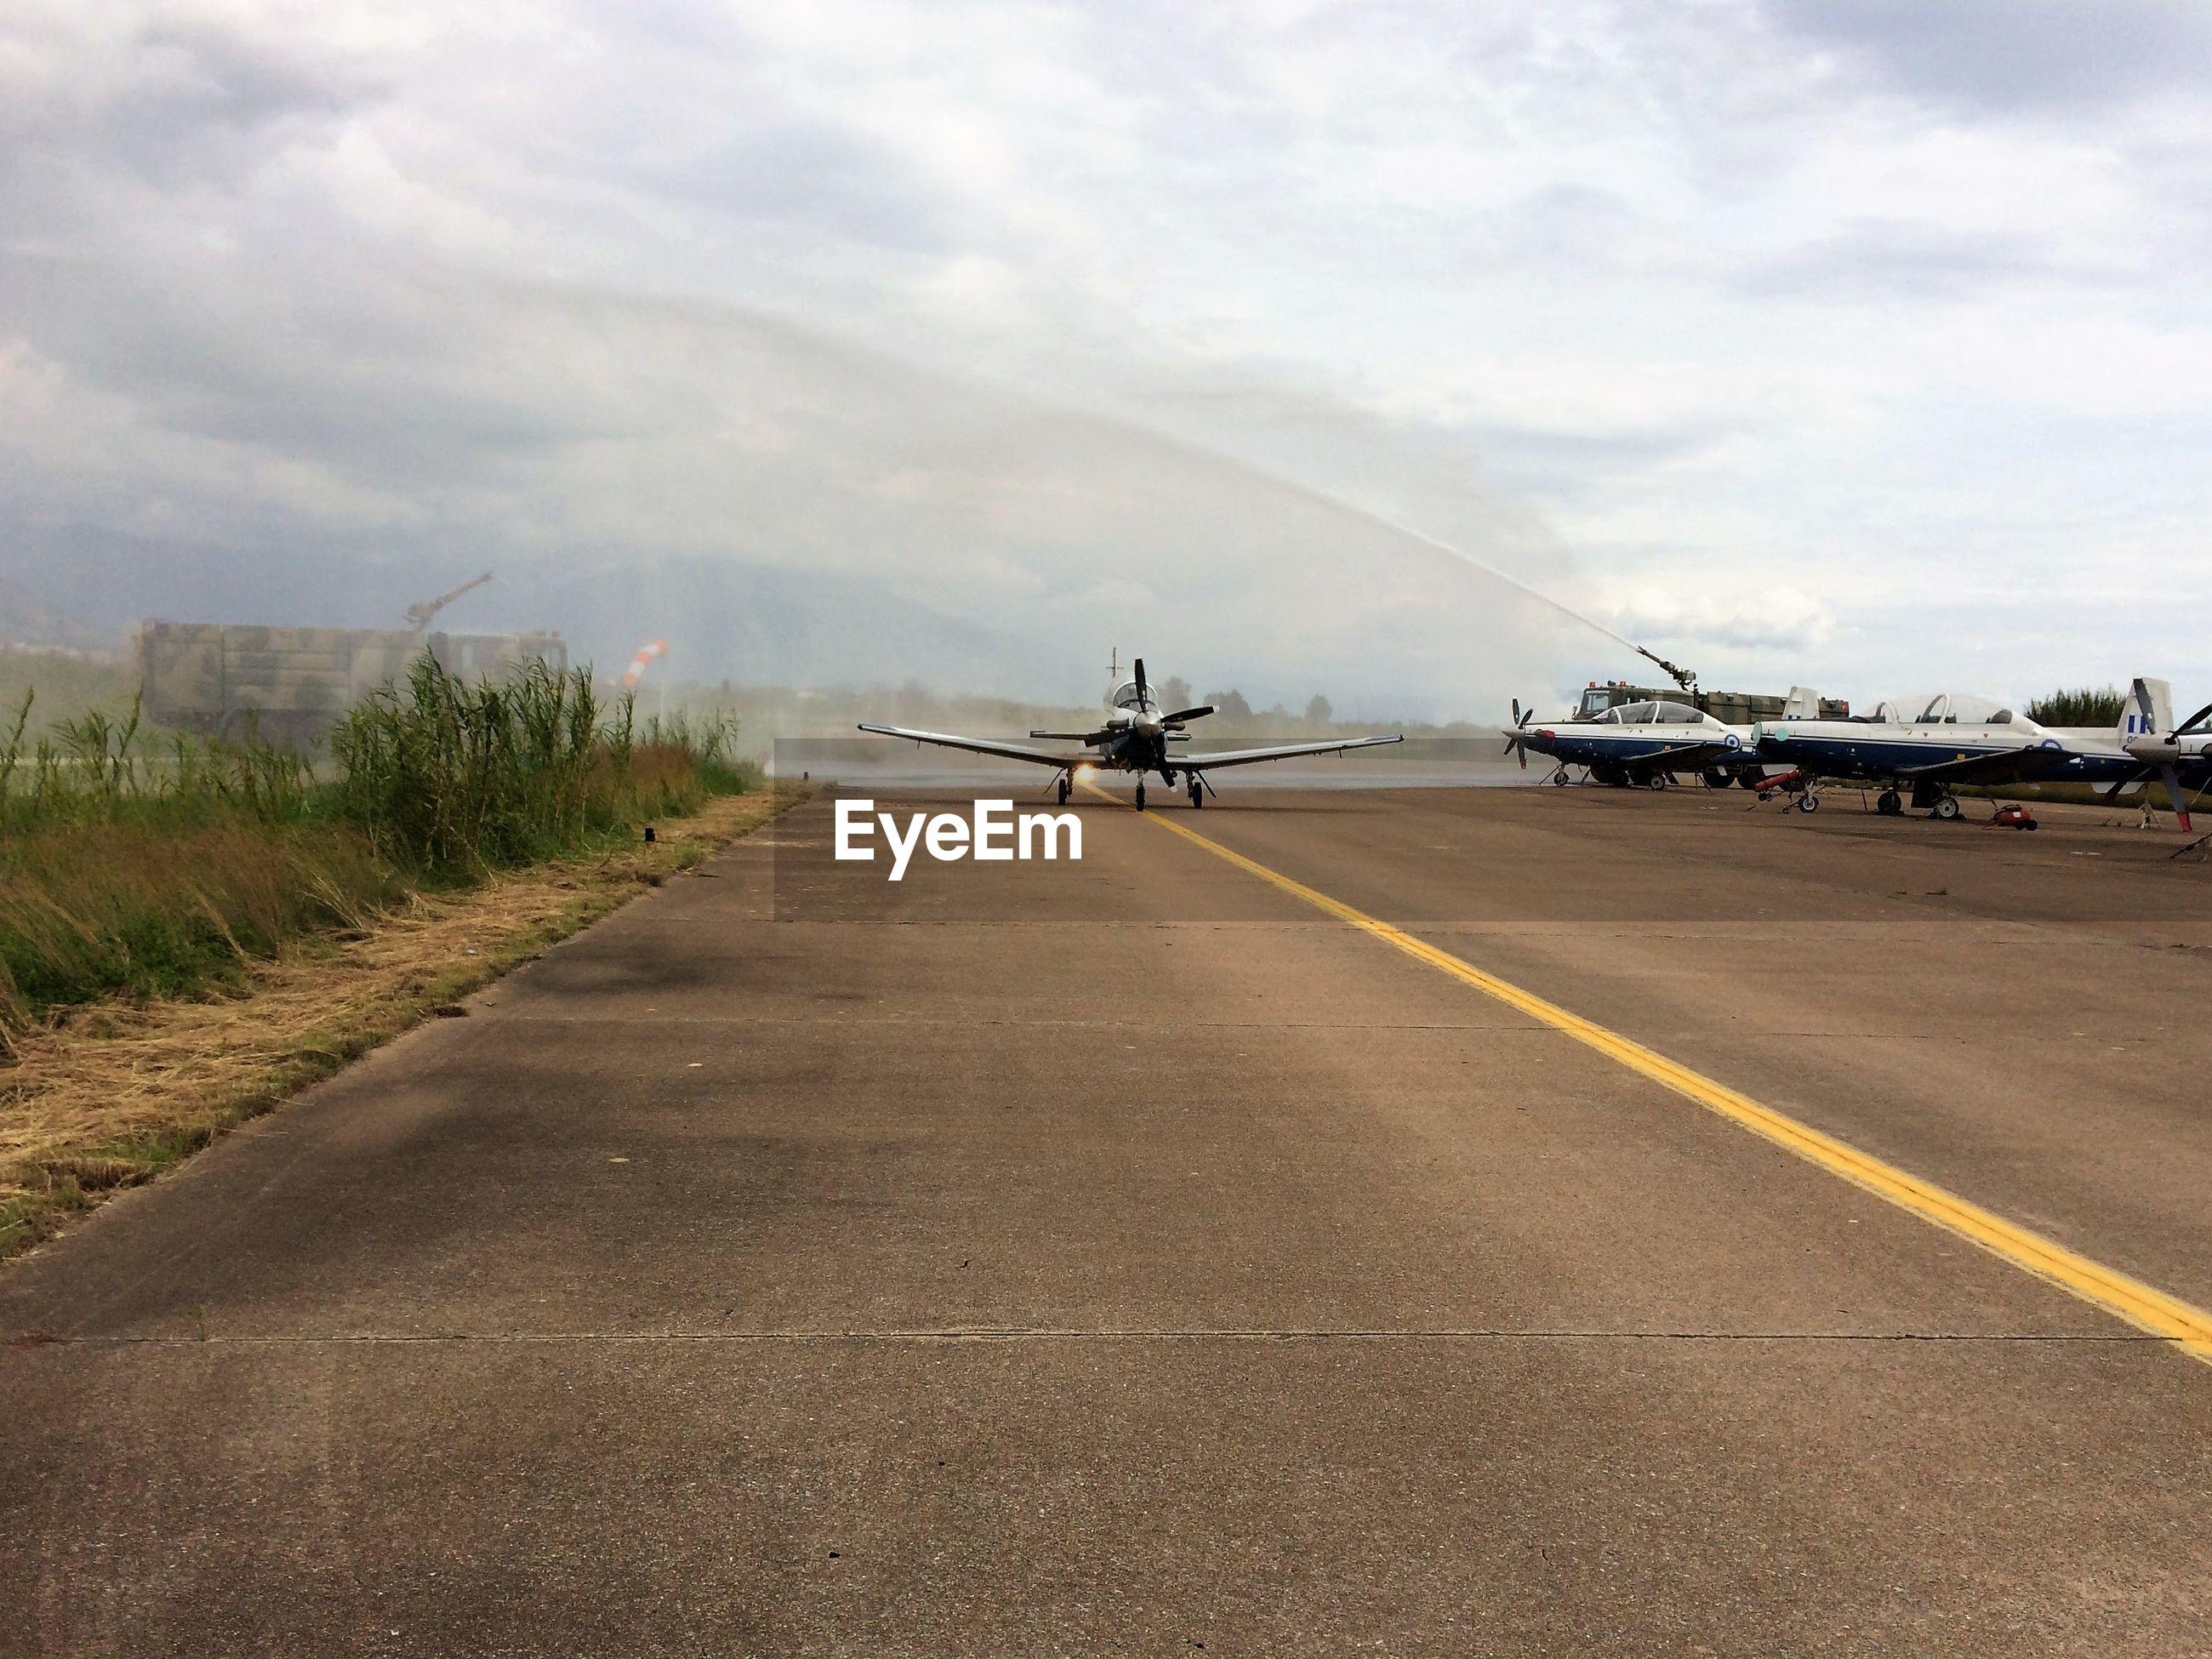 Airplanes at airport runway against sky